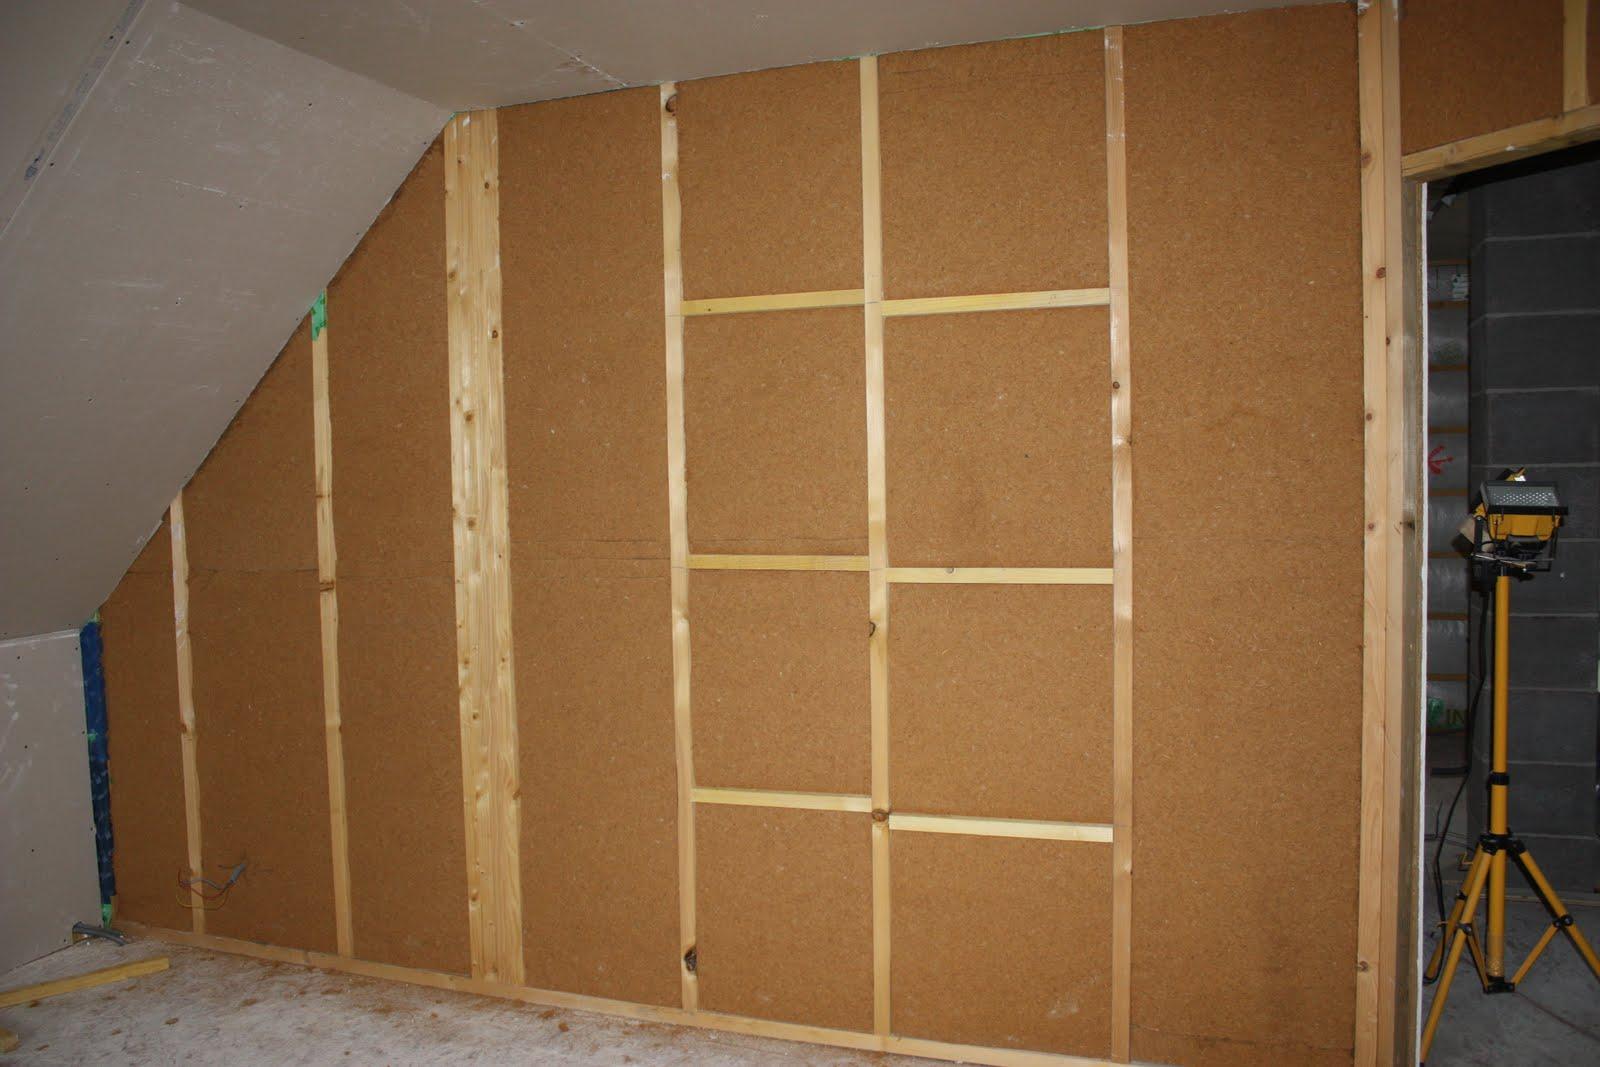 mob ossature bois isolation energie domotique bbc knx alsace isolation des. Black Bedroom Furniture Sets. Home Design Ideas